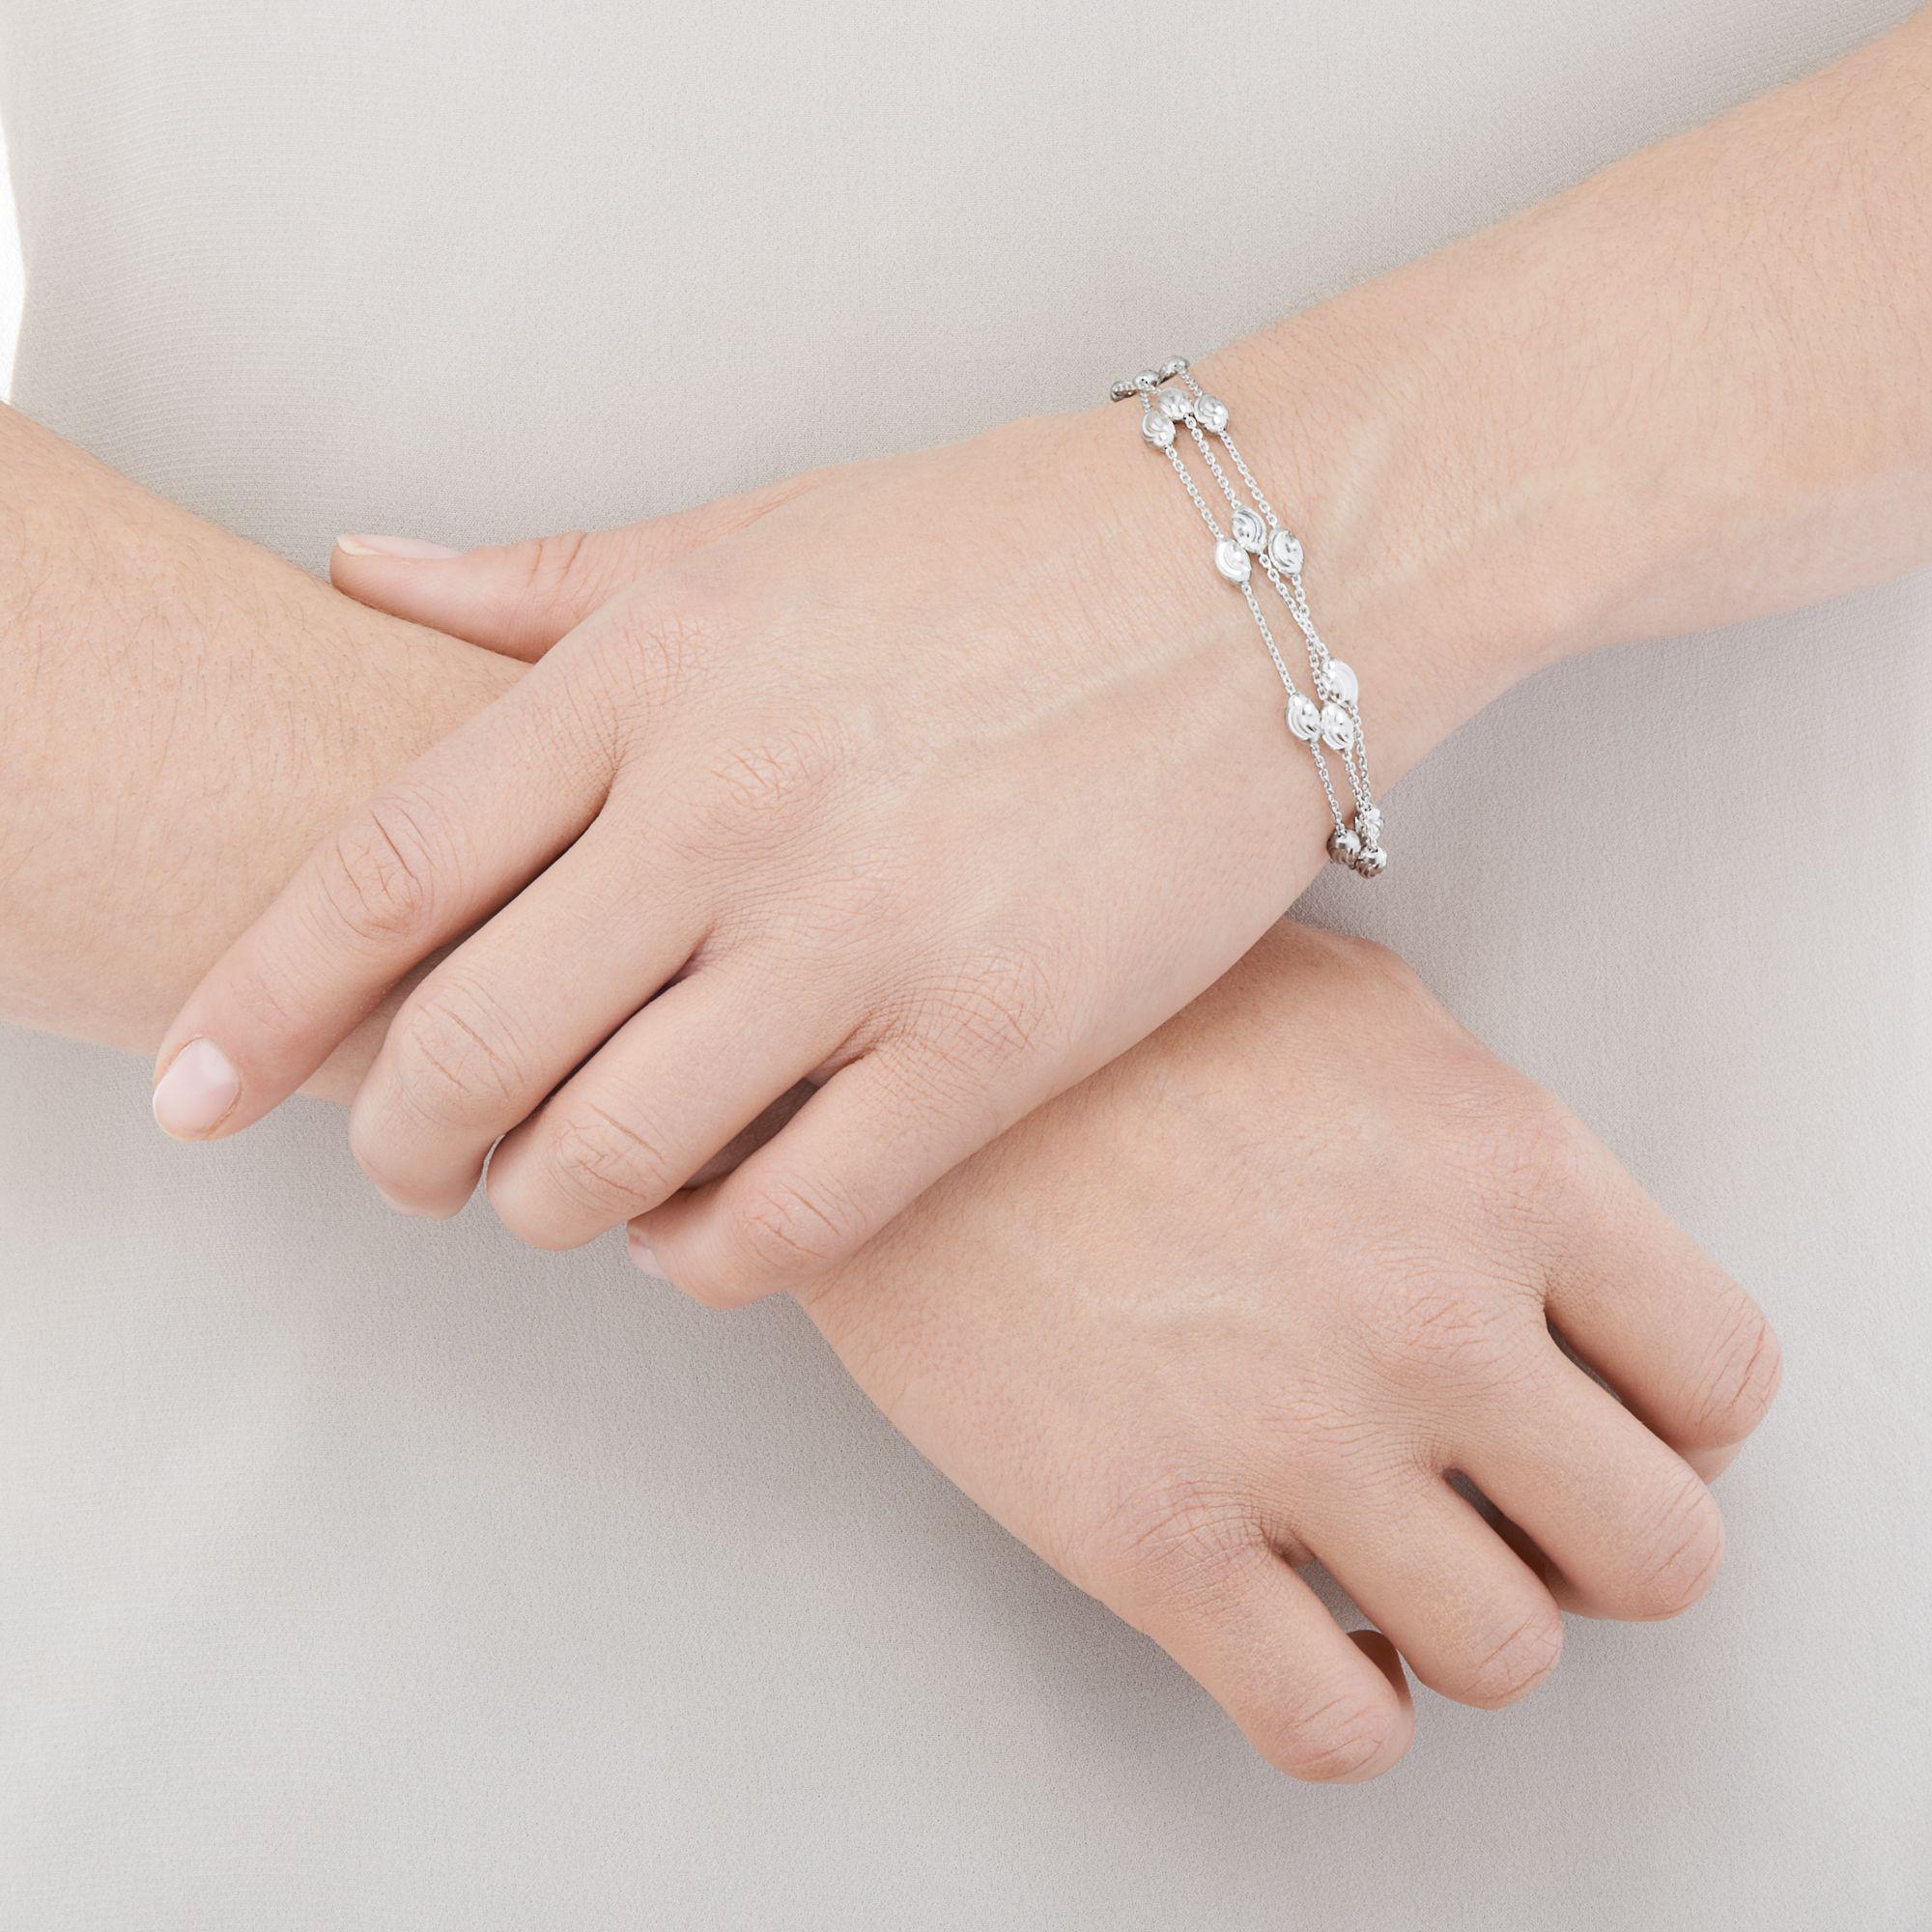 984bb6c64dbf5 Links of London - Metallic Essentials Sterling Silver Beaded Chain 3 Row  Bracelet - Lyst. View fullscreen